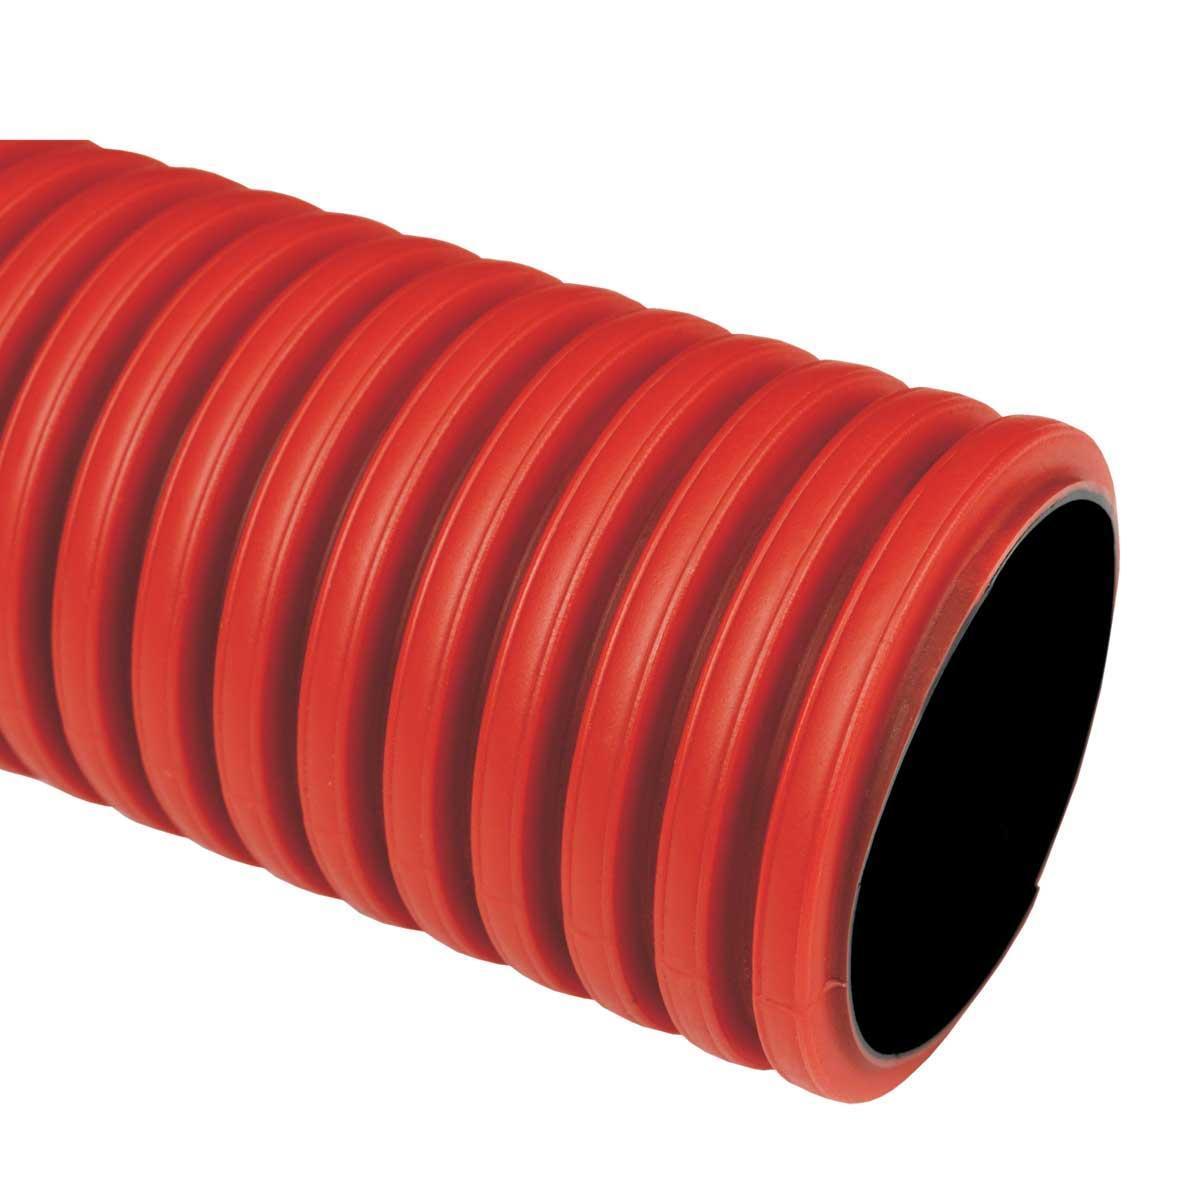 Труба гофрована жорстка двошарова Коподур, червона, протяжка, ; Ø200мм; поліетилен HDPE; довжина 6 м